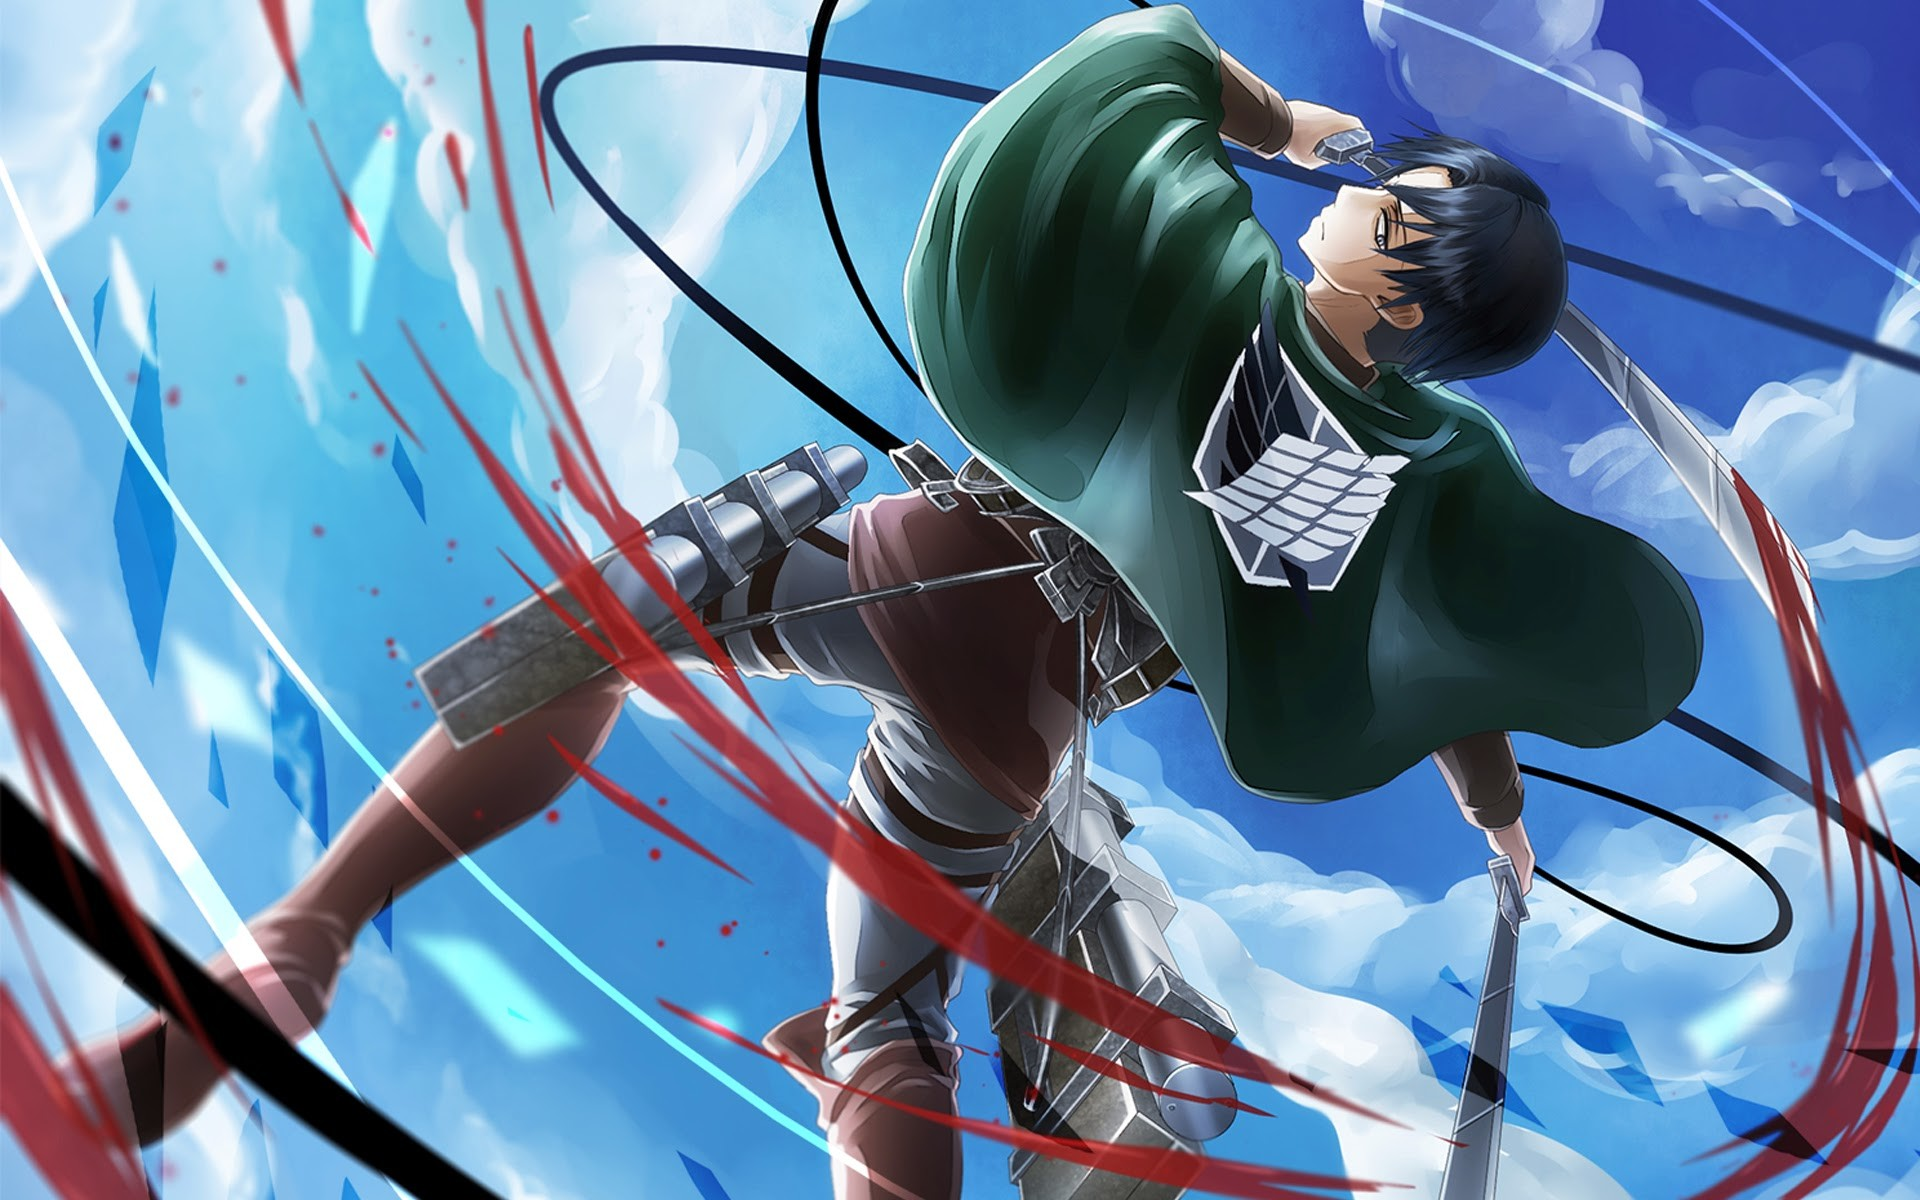 levi attack on titan shingeki no kyojin anime hd wallpaper .